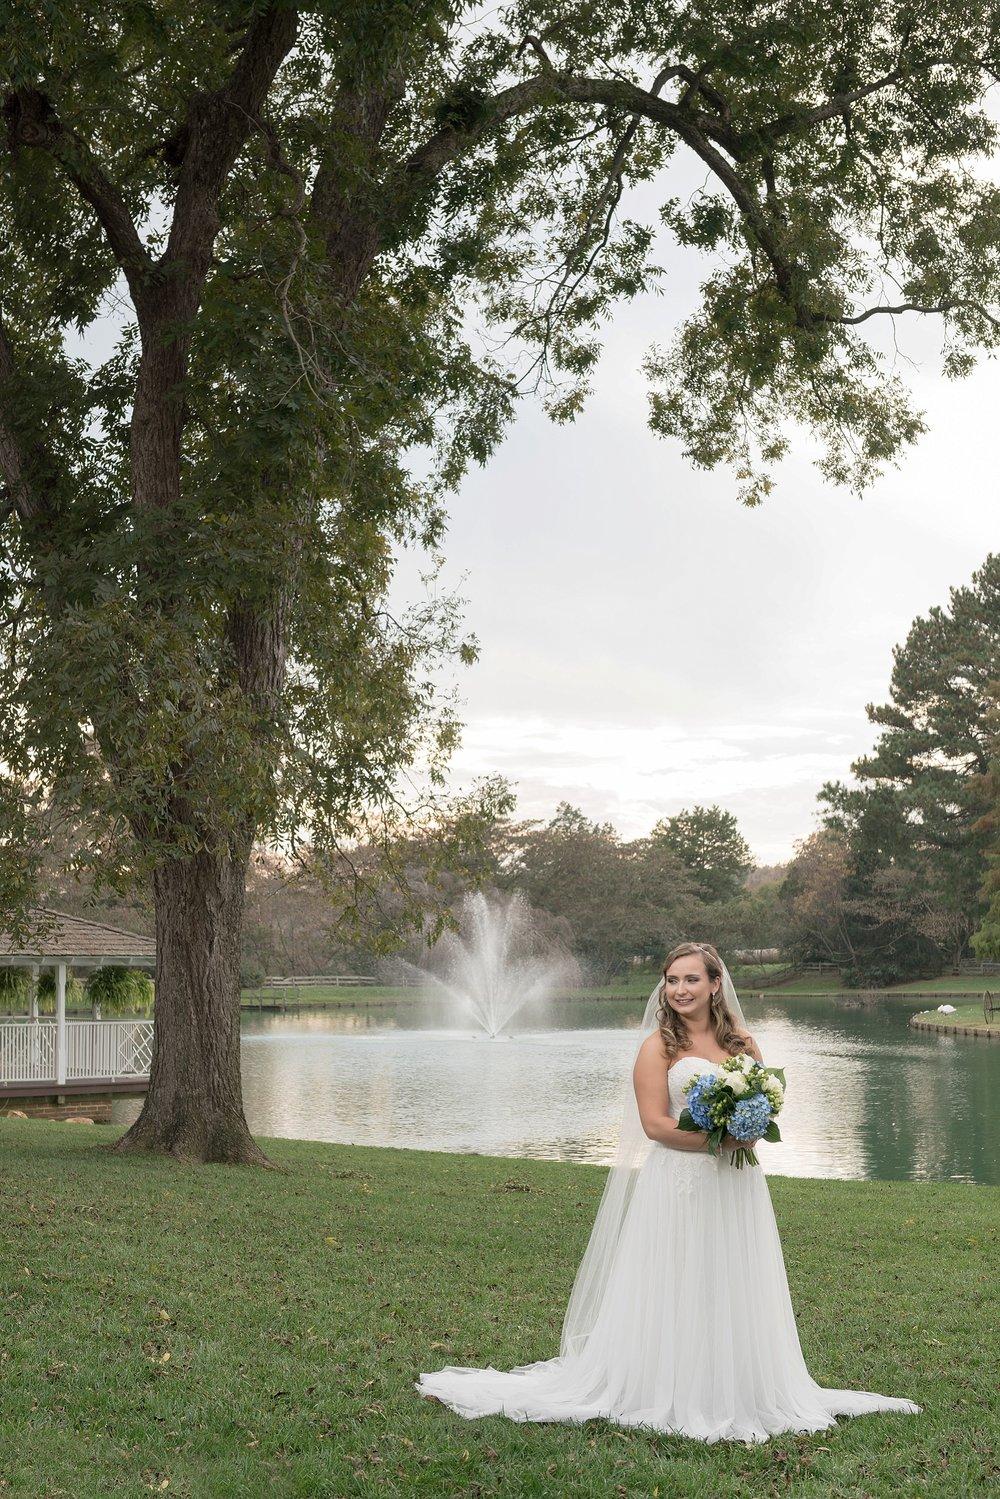 Rose-Hill-Plantation-Wedding-Photographer-062.jpg